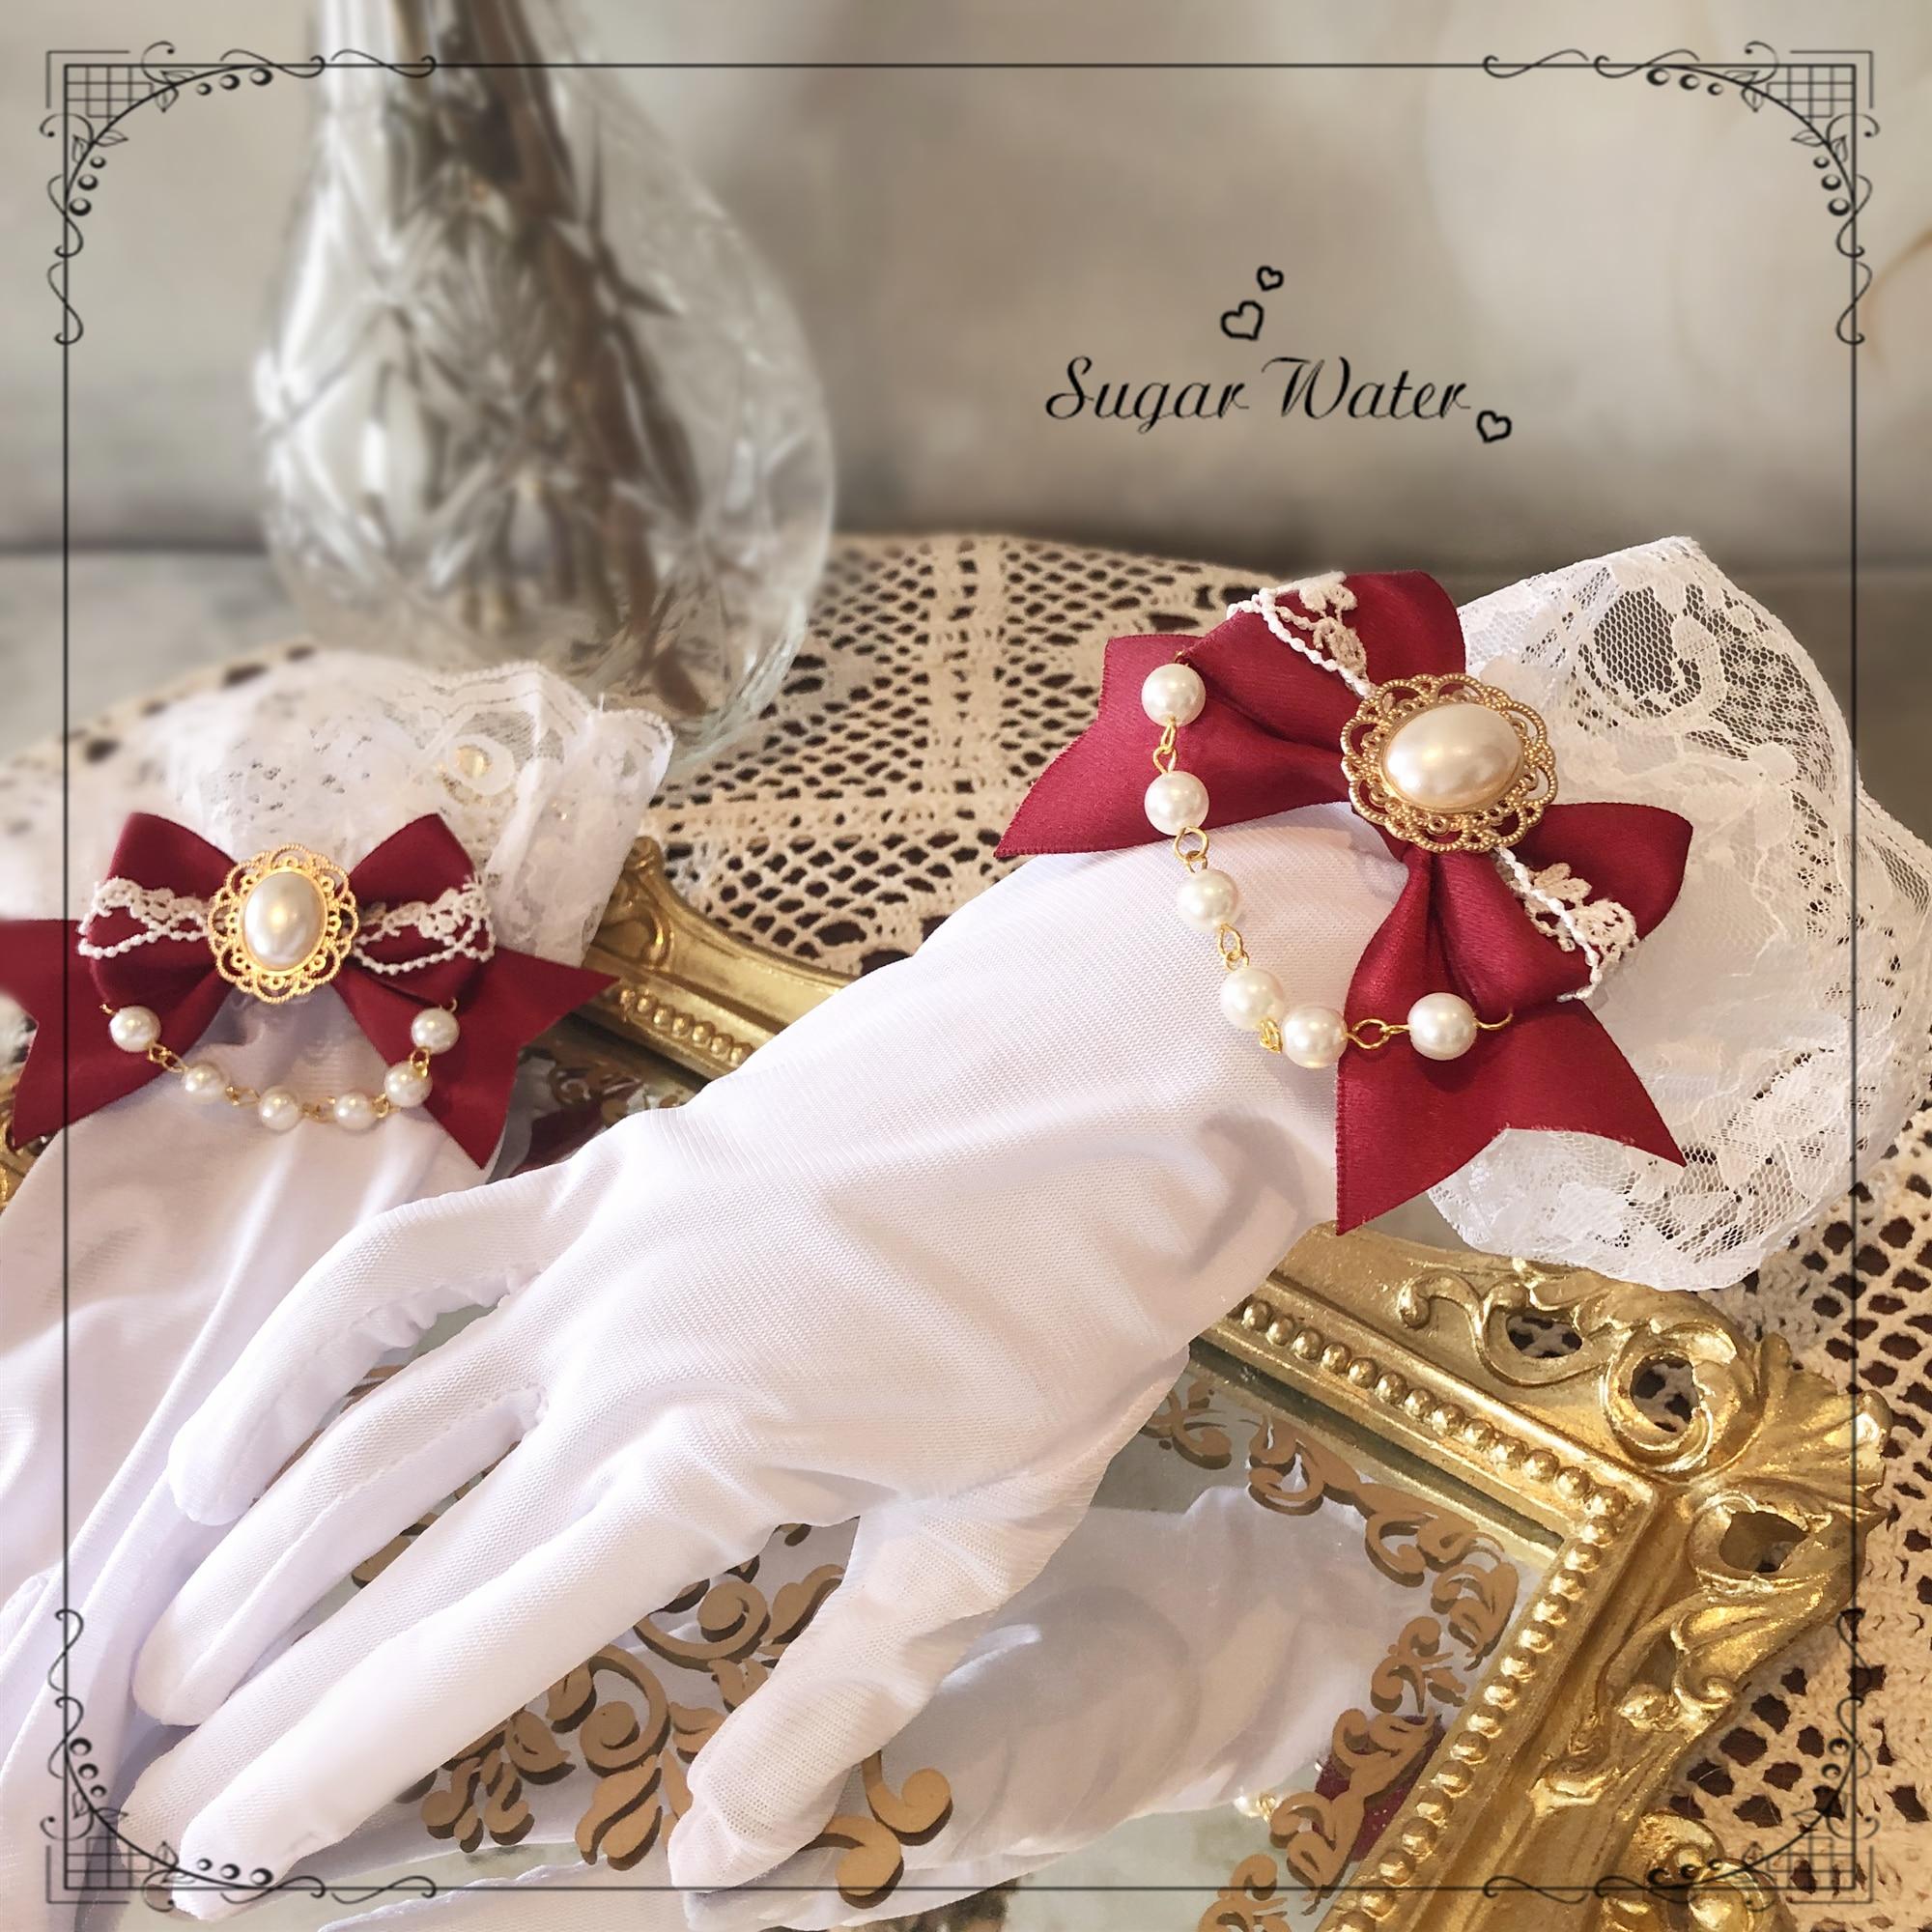 Flor boda novia hermoso arco perla cadena guantes Cosplay fiesta de té princesa suave chica dulce Lolita mano CUFF Accesorios